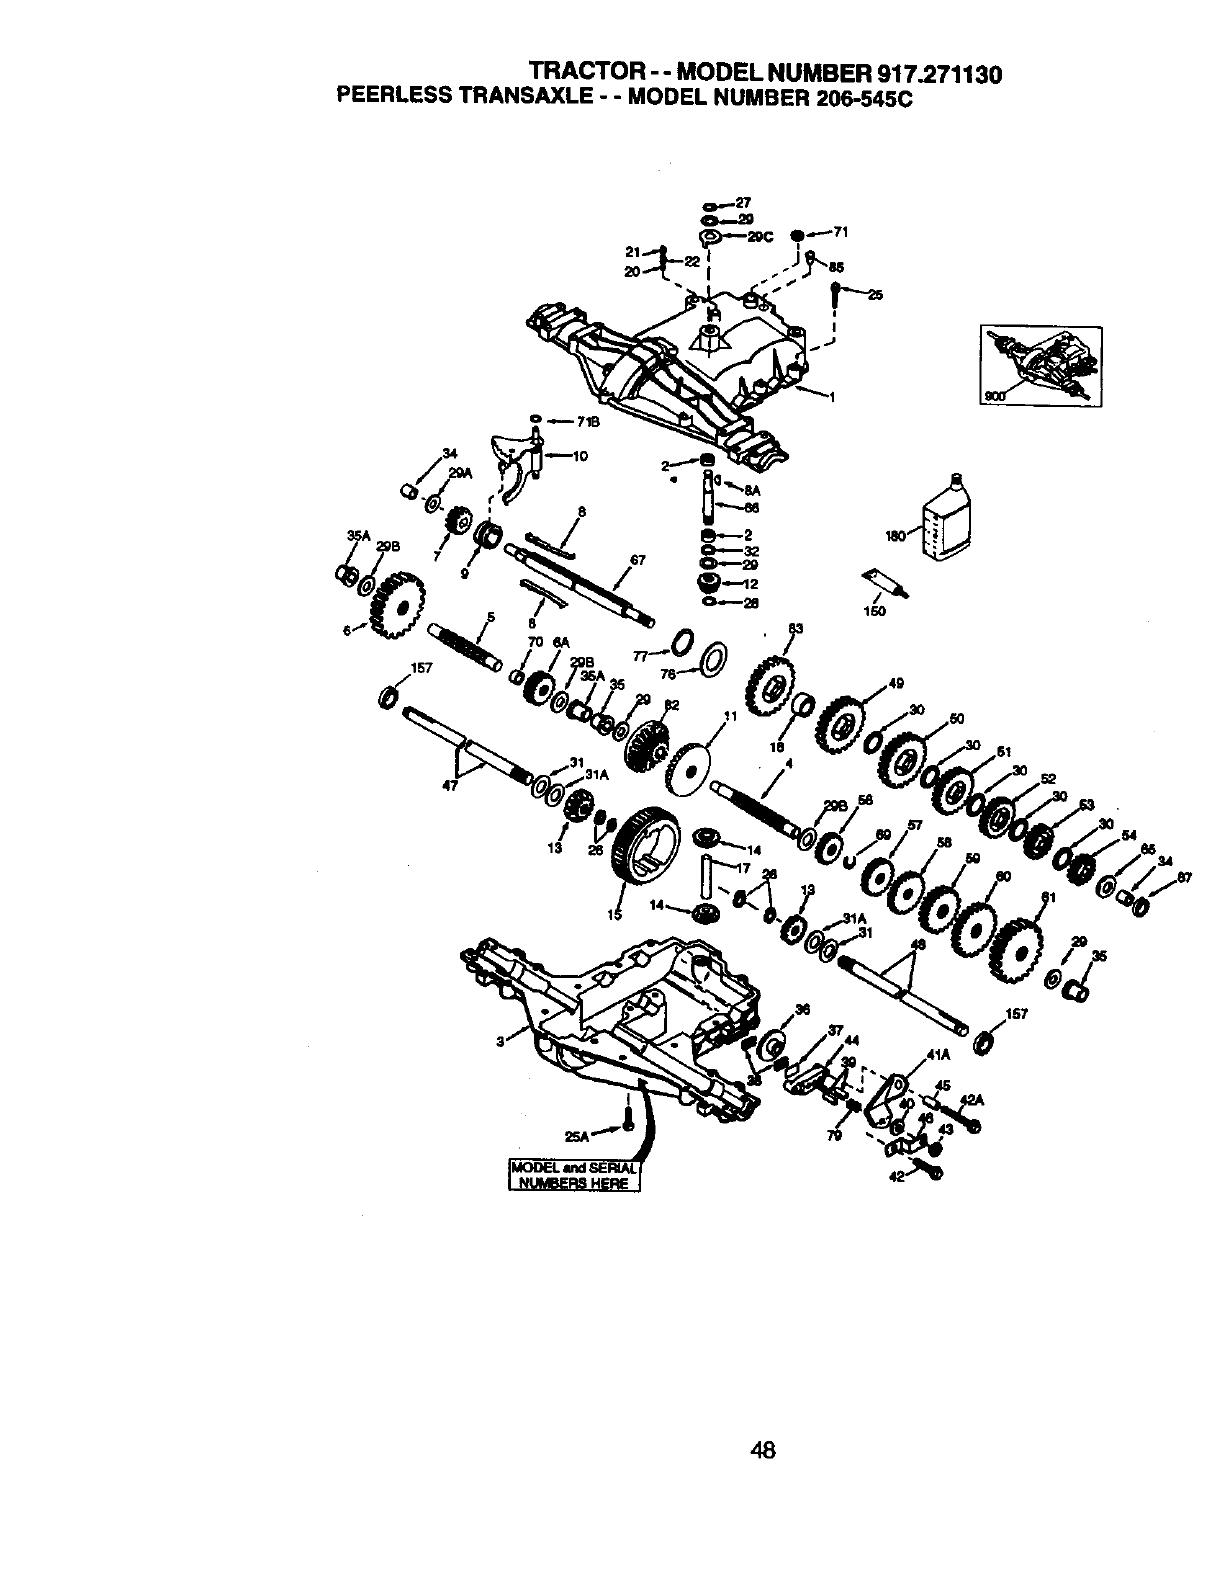 Craftsman 917.27113